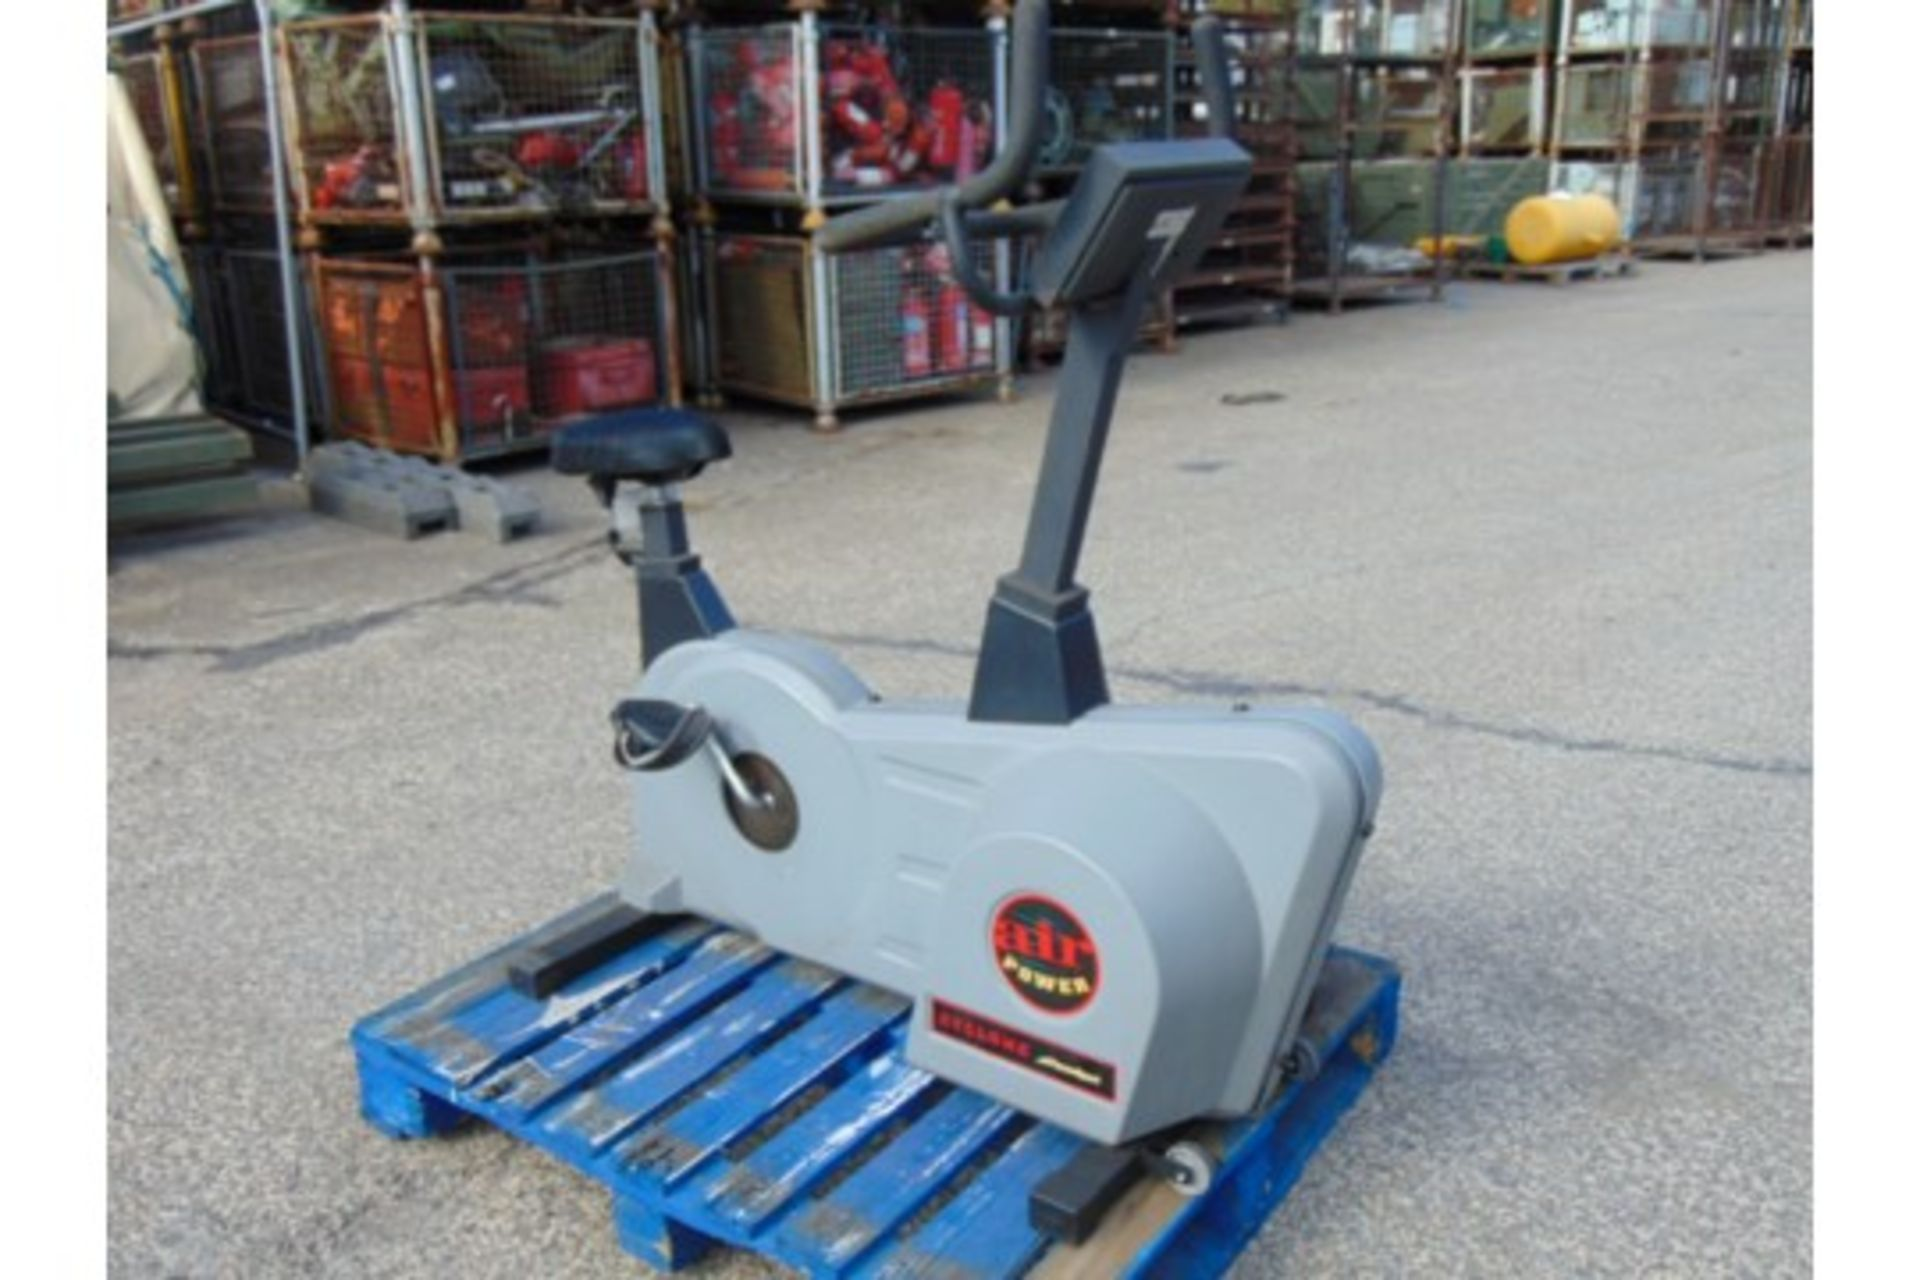 Lot 25843 - Powersport XT1000 Cyclone Exercise Bike